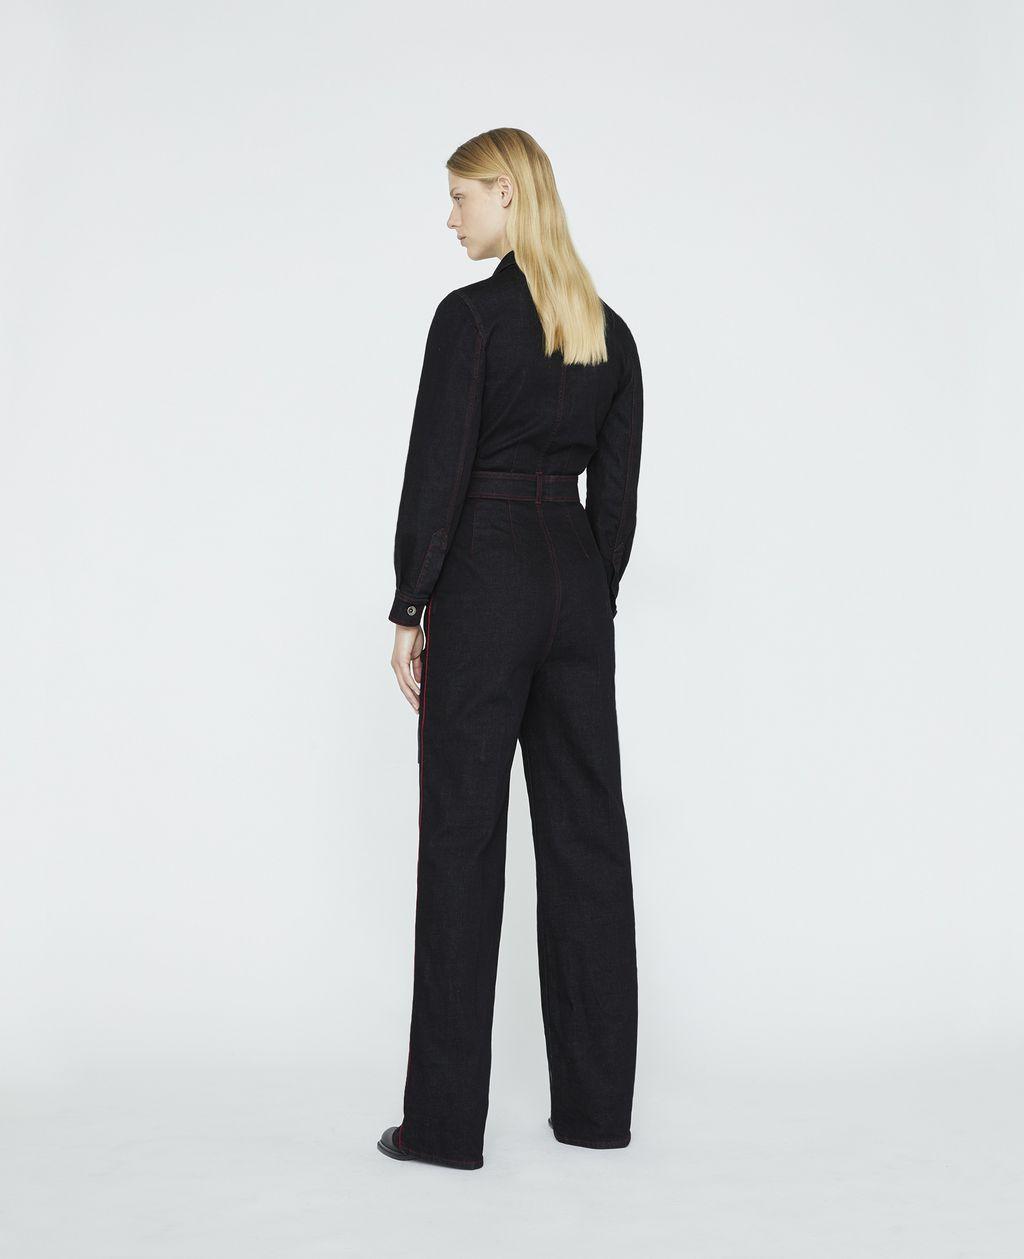 Stella McCartney Janessa Organic Denim Jumpsuit